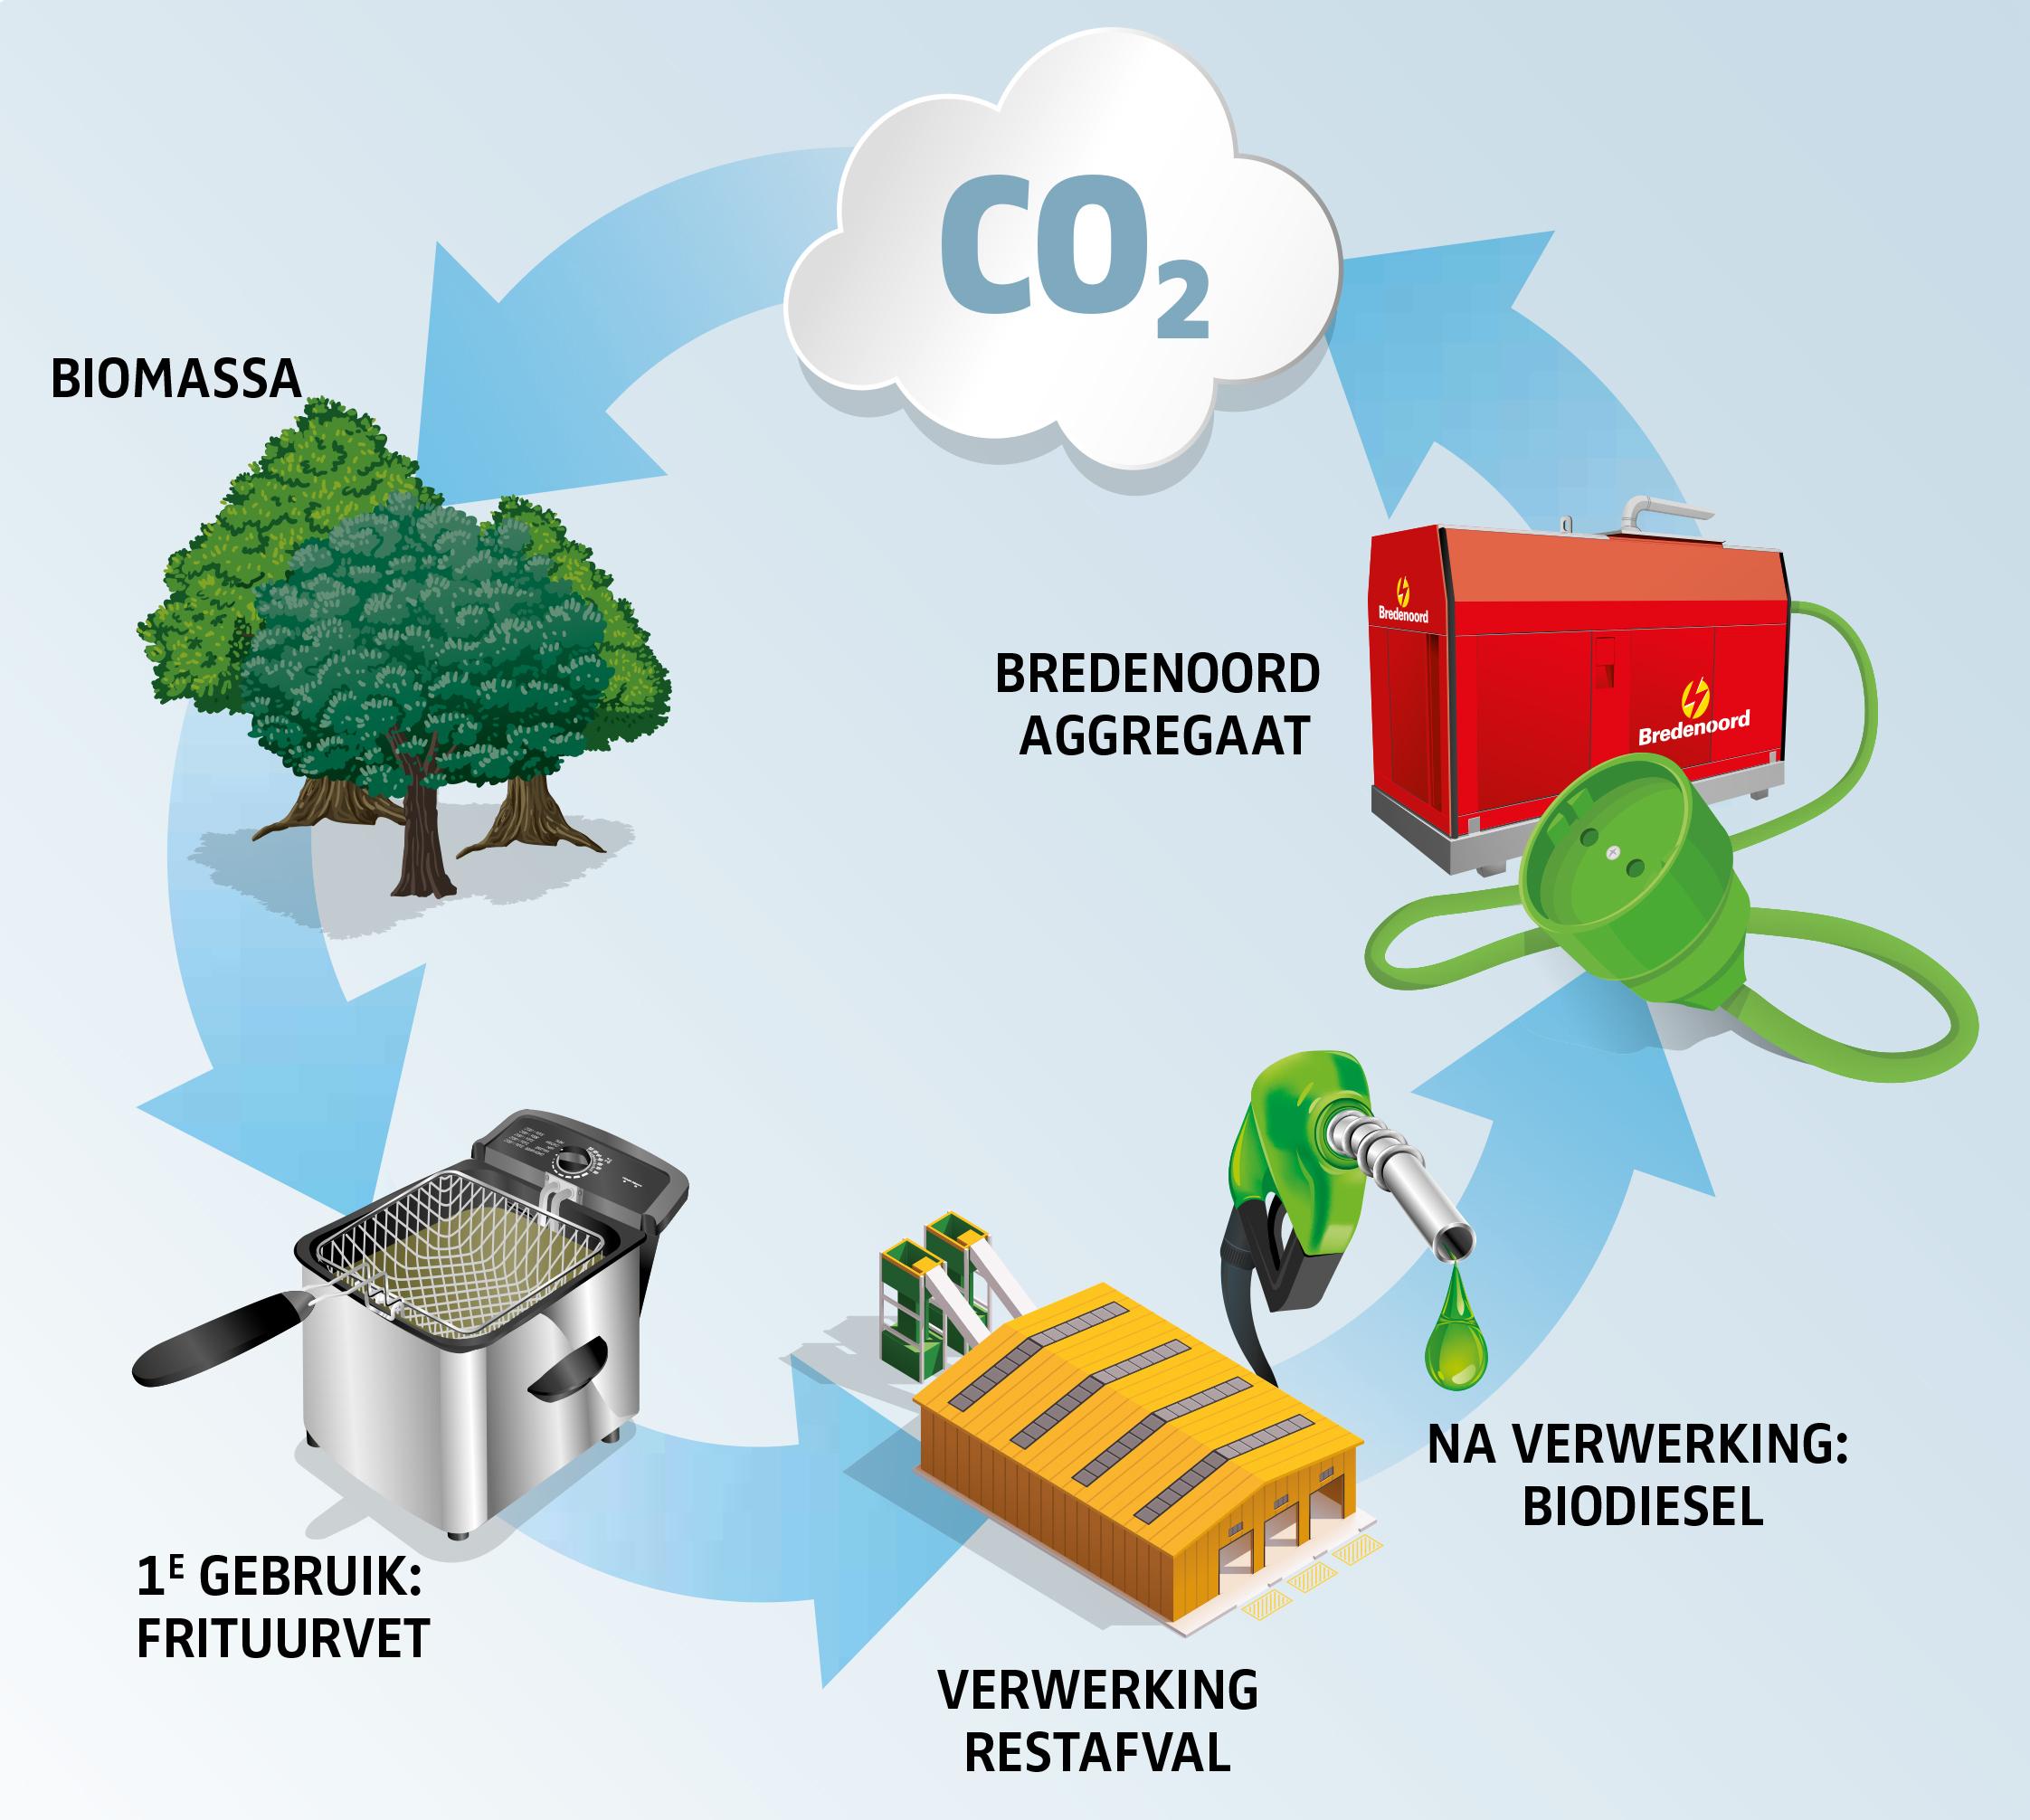 Bredenoord-asset-Infographic-Groene-stroom.jpg#asset:24017:url